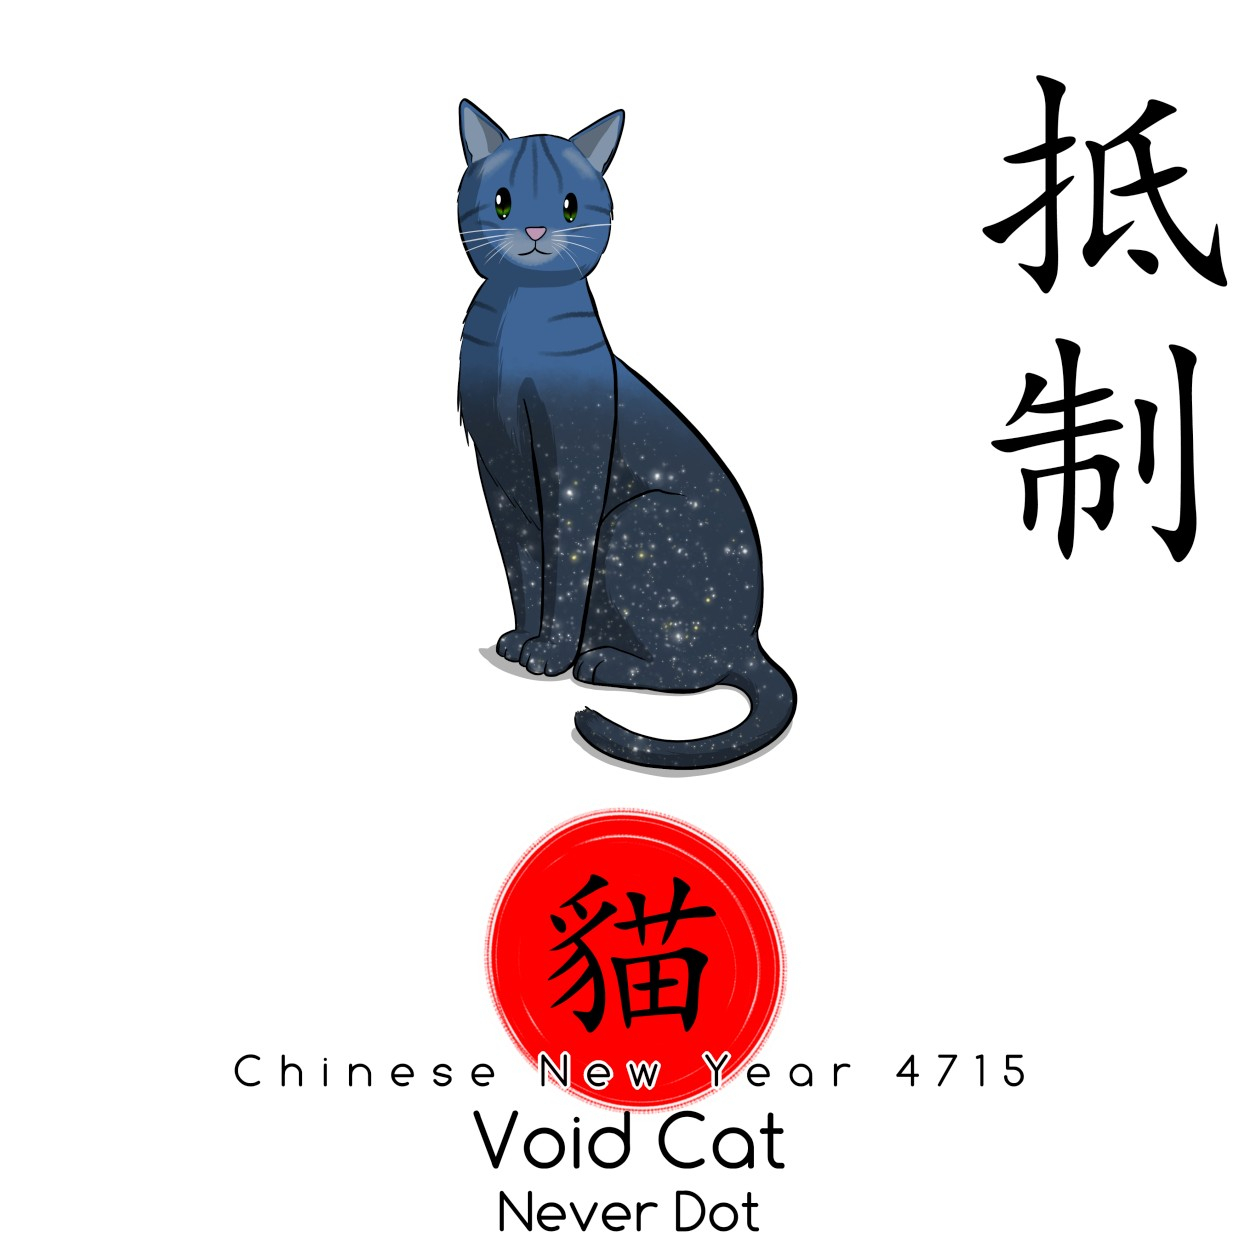 Chinese New Year 4715 • Void Cat